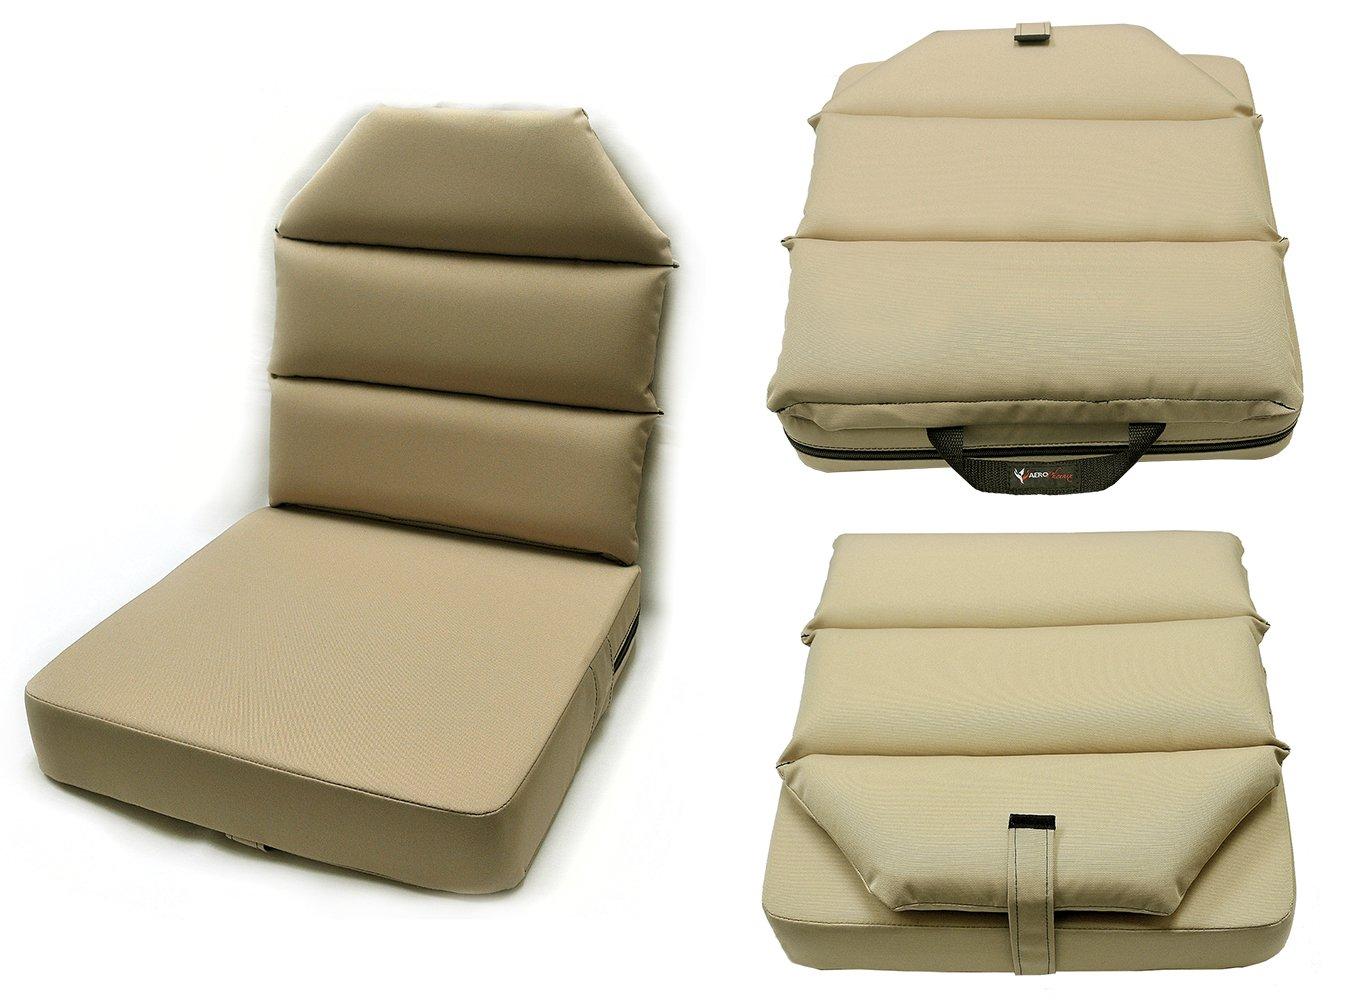 AeroPhoenix Seat Cushion with Back - 3'' Bottom, 2'' Back - Tan